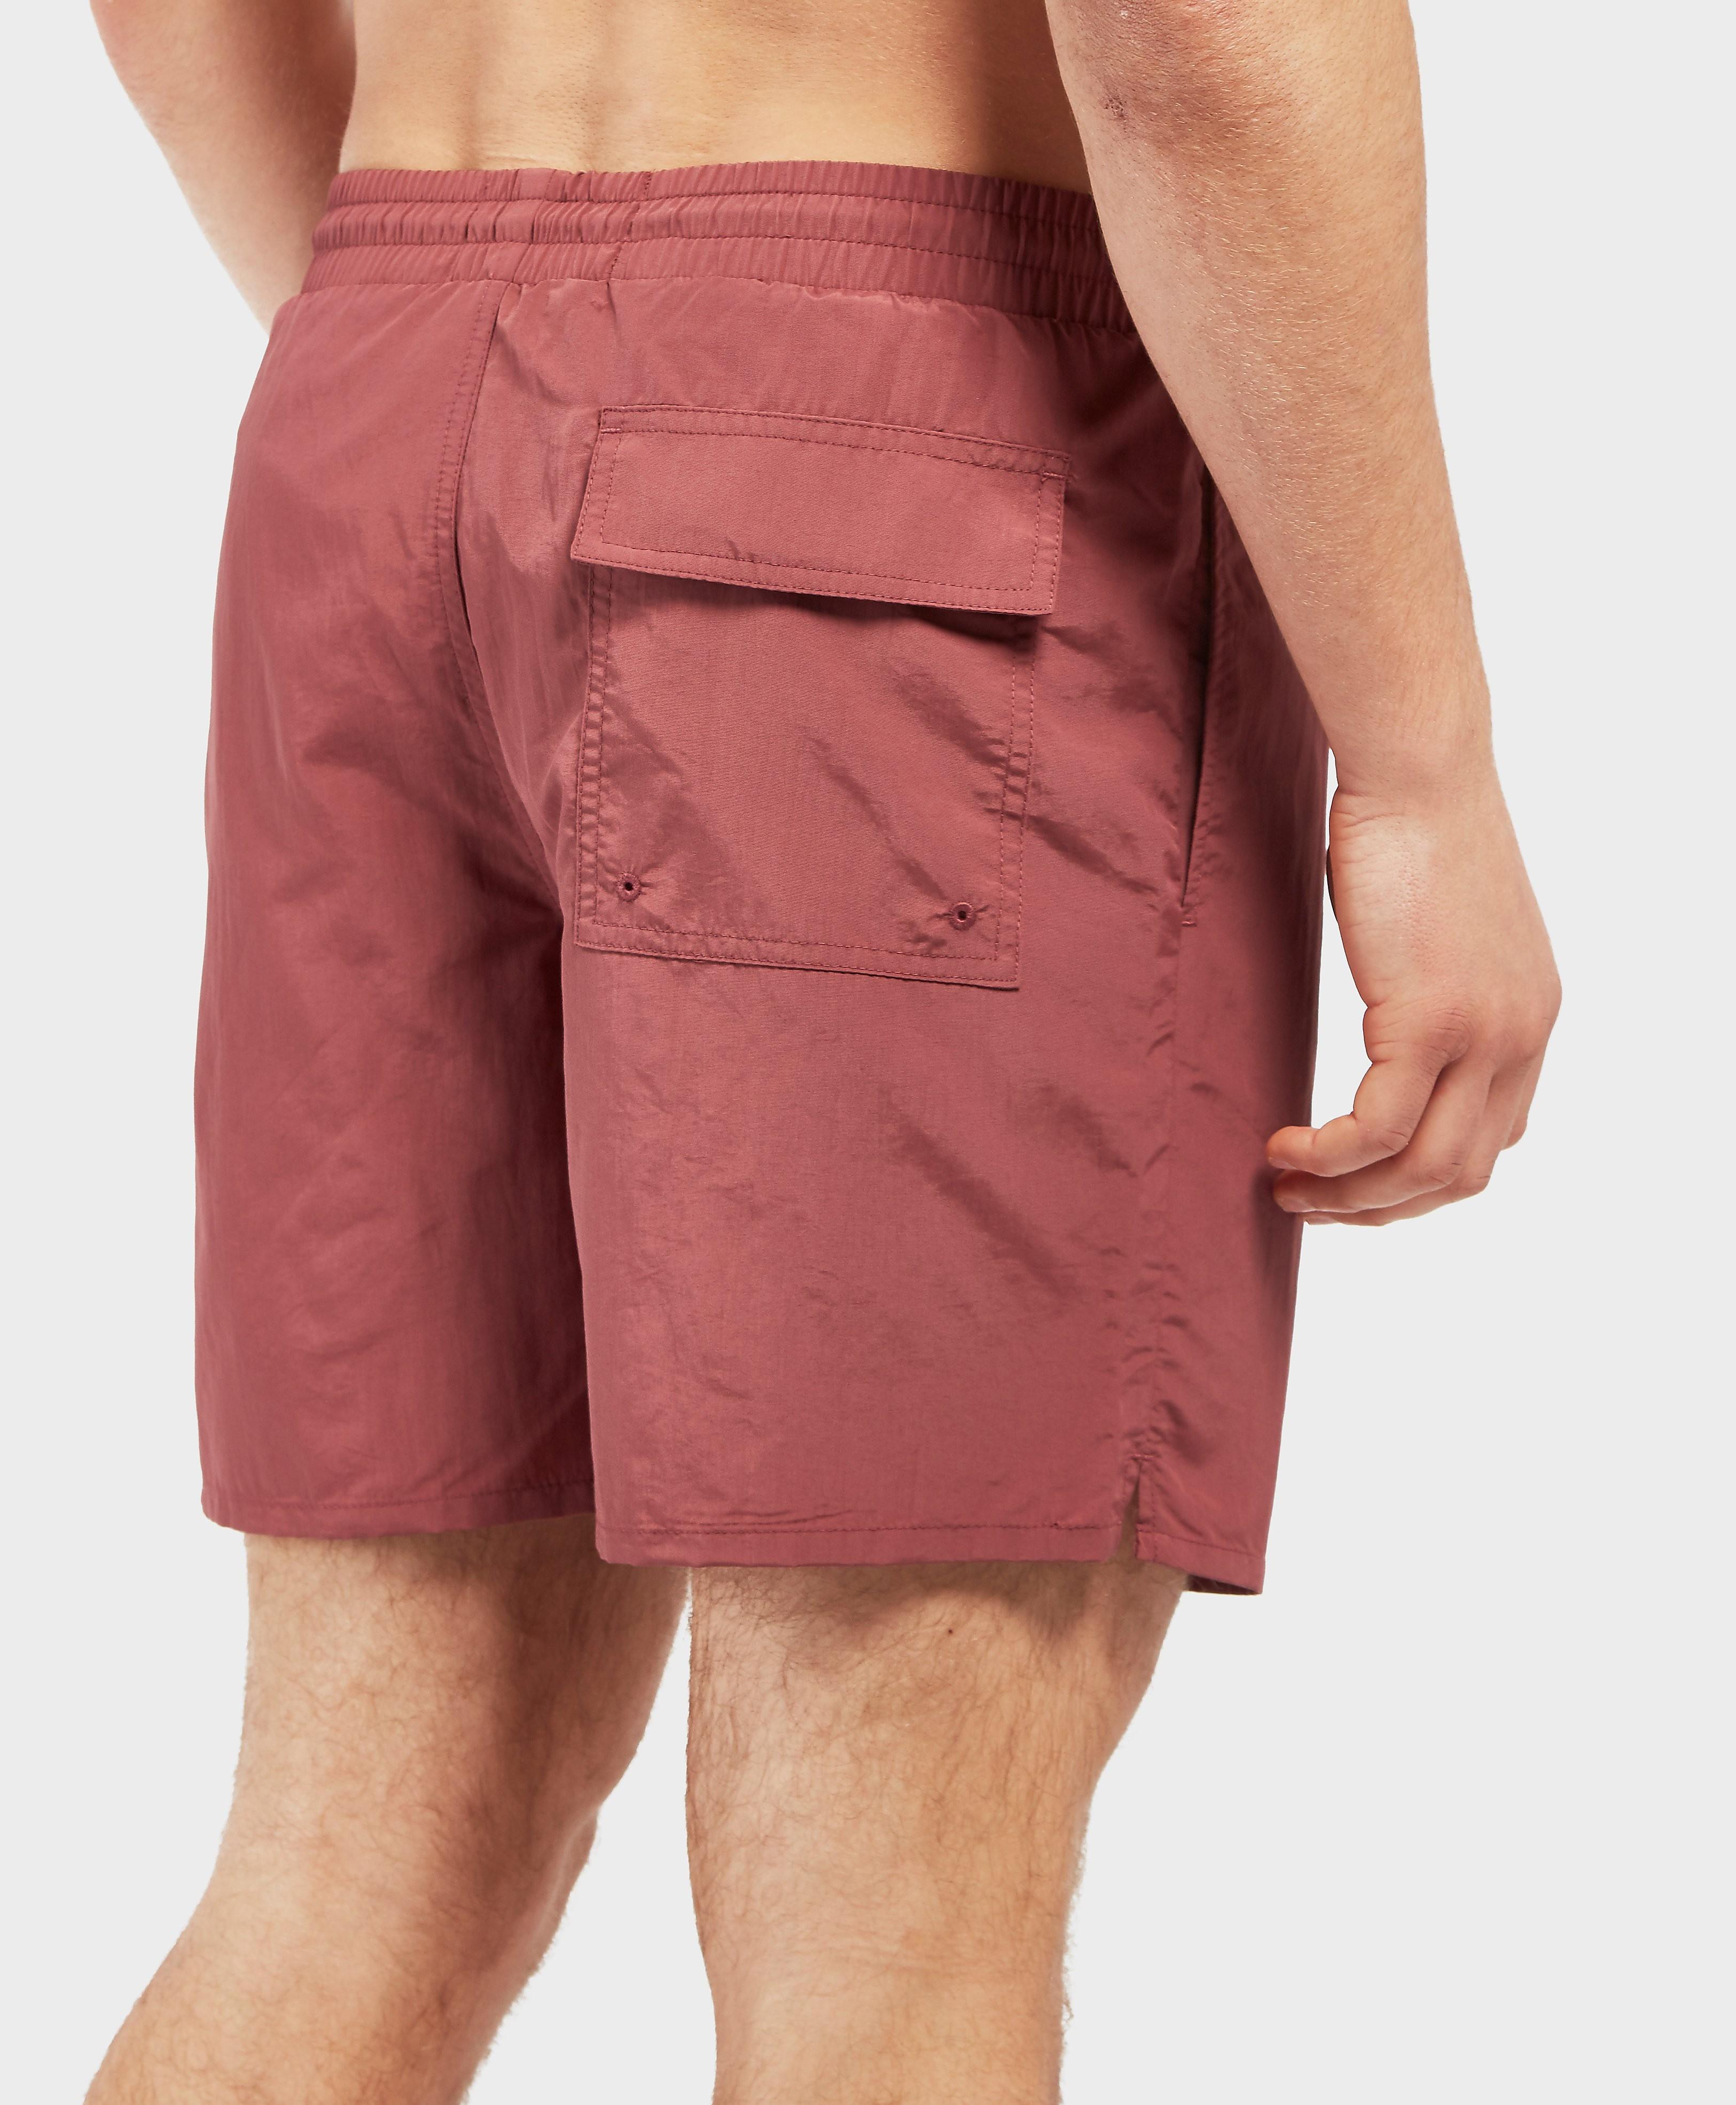 Lyle & Scott Plain Swim Shorts